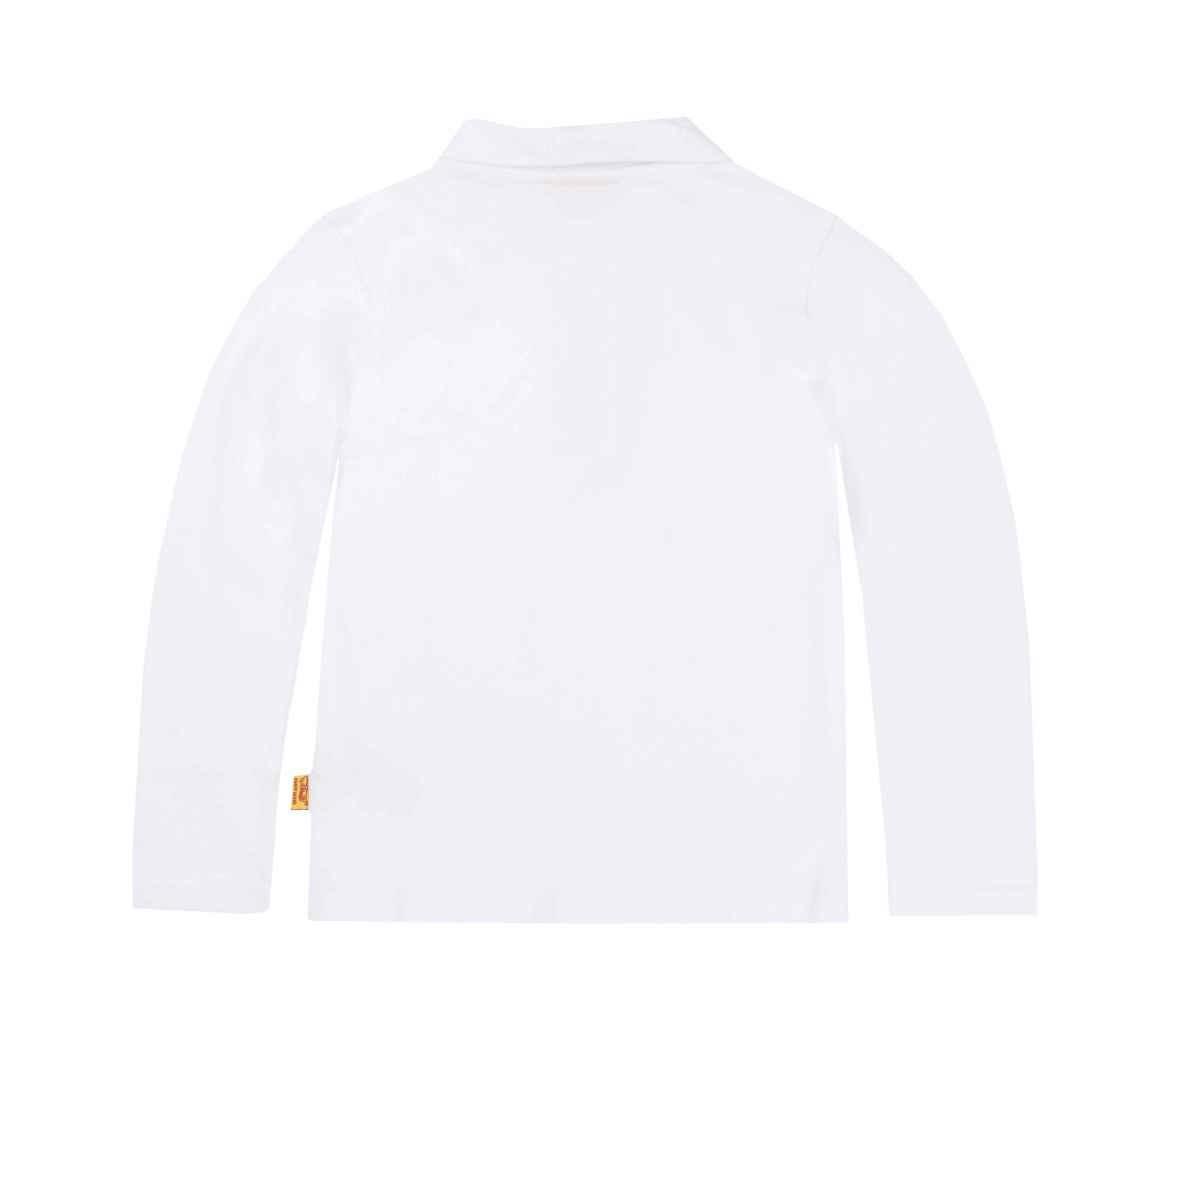 Steiff Steiff White Polo Shirt With Teddy Motif